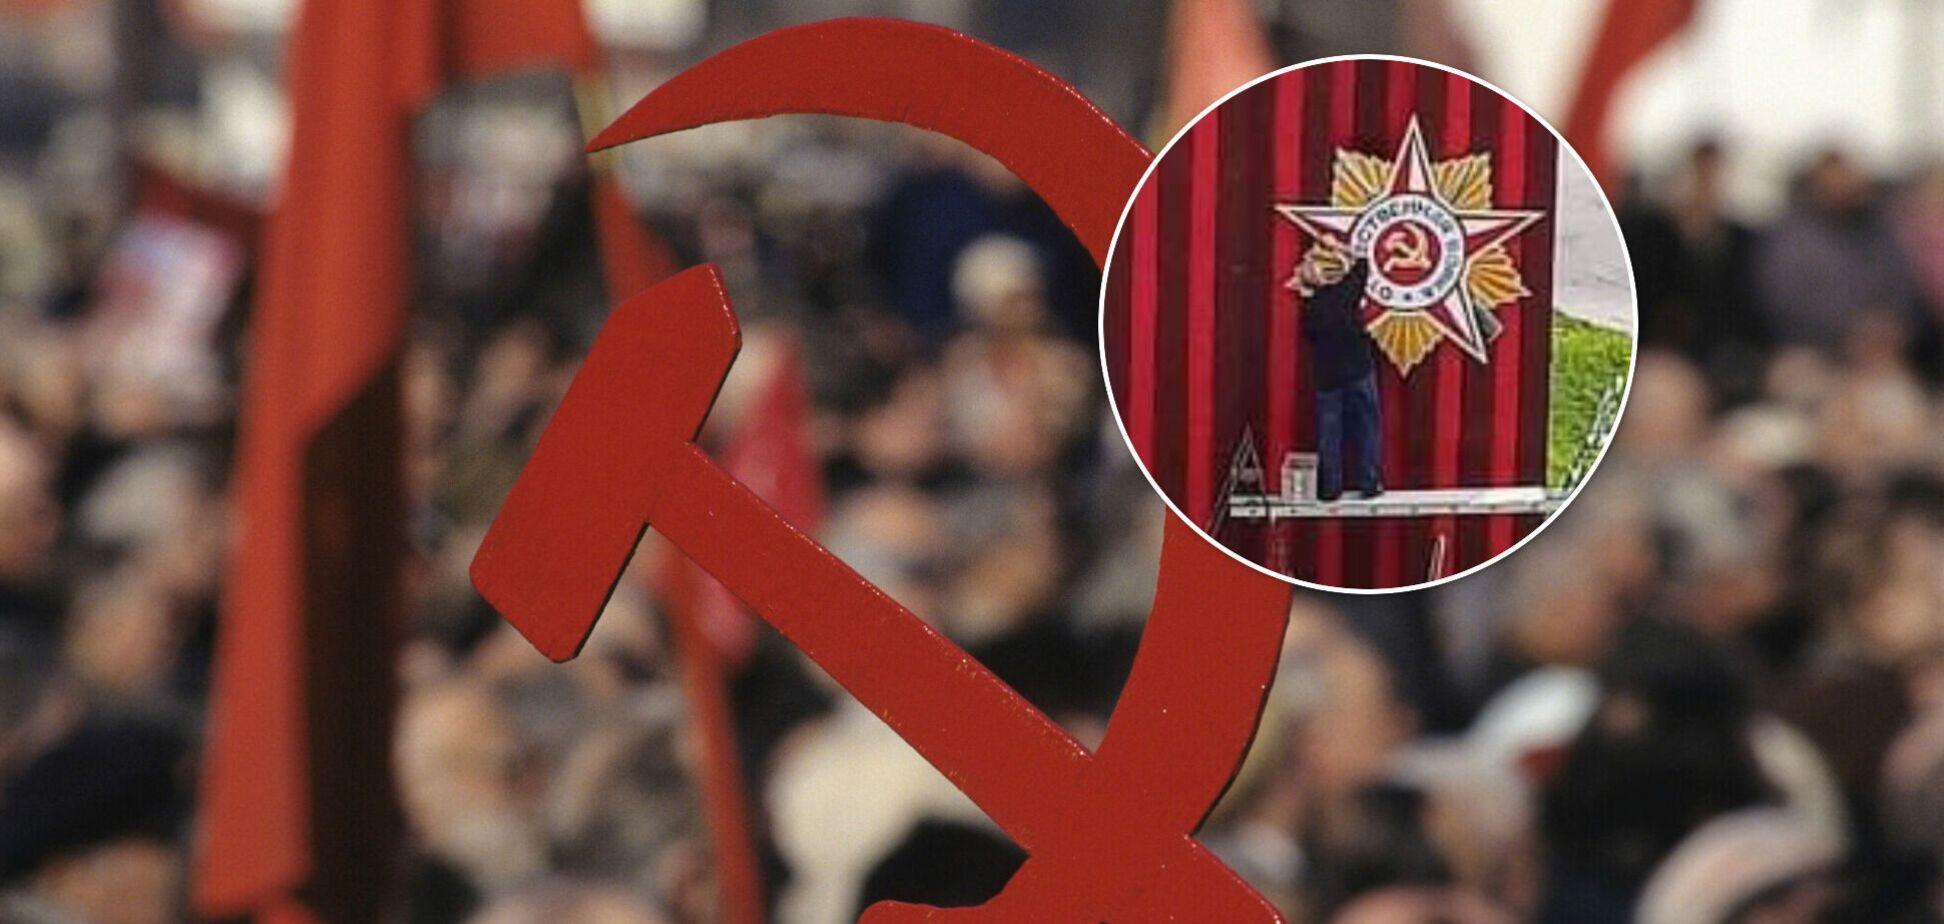 Скандал із символікою СРСР